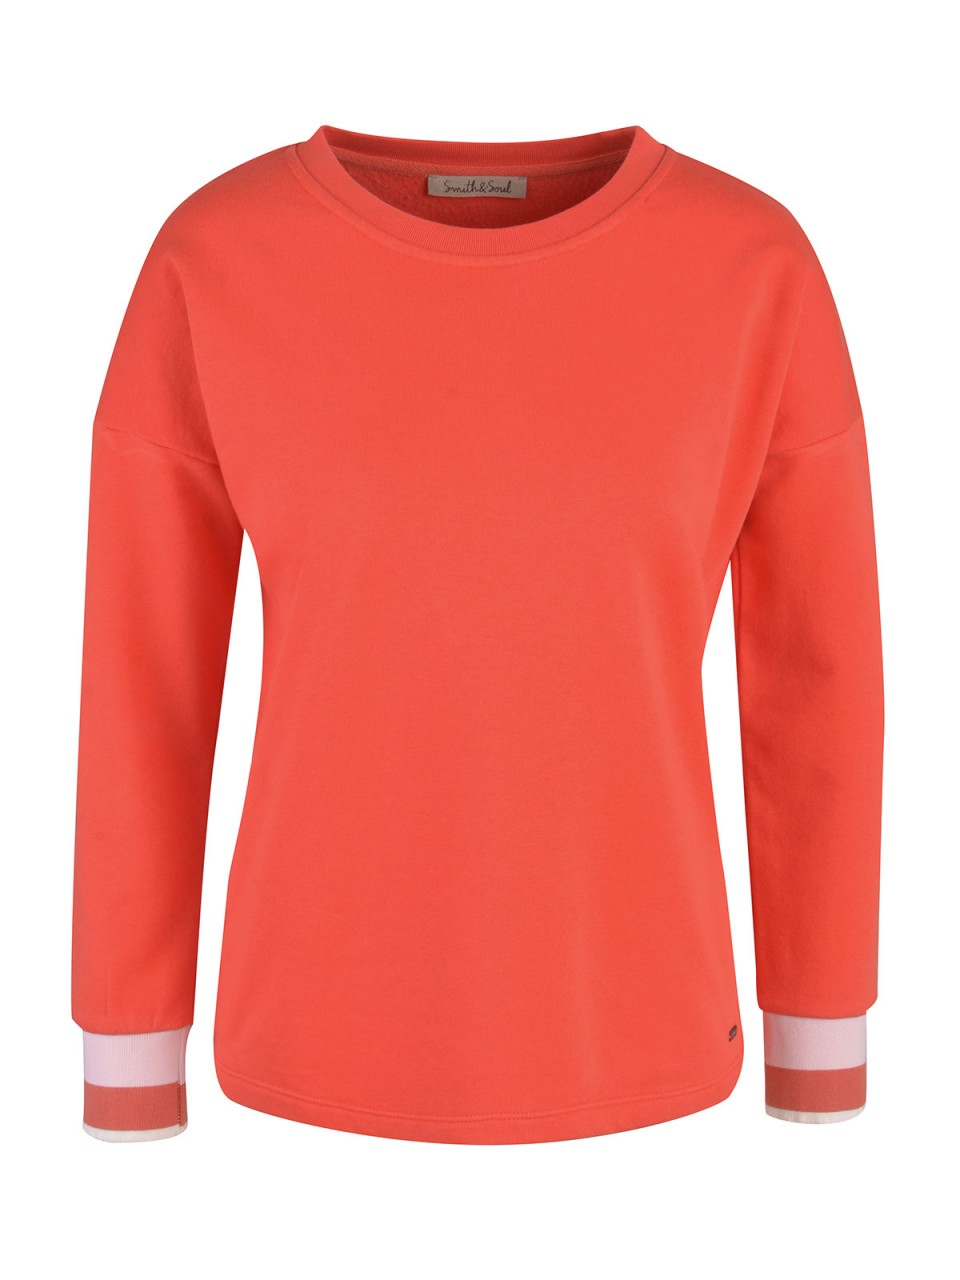 Oberteile - SMITH SOUL Damen Sweatshirt, rot  - Onlineshop Designermode.com